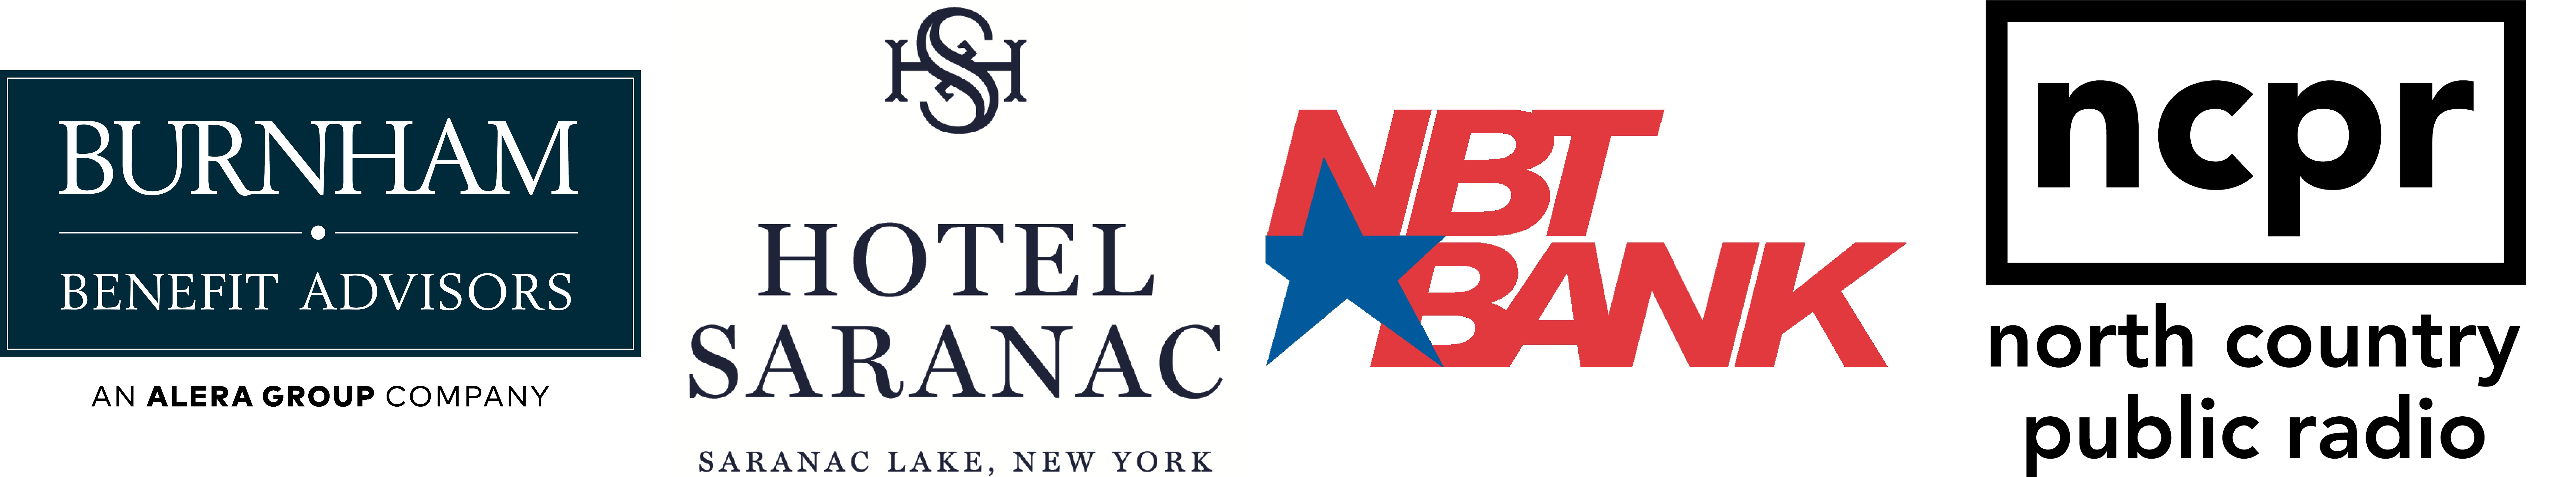 Logos for Burnham Benefit Advisors, Hotel Saranac, NBT Bank and NCPR